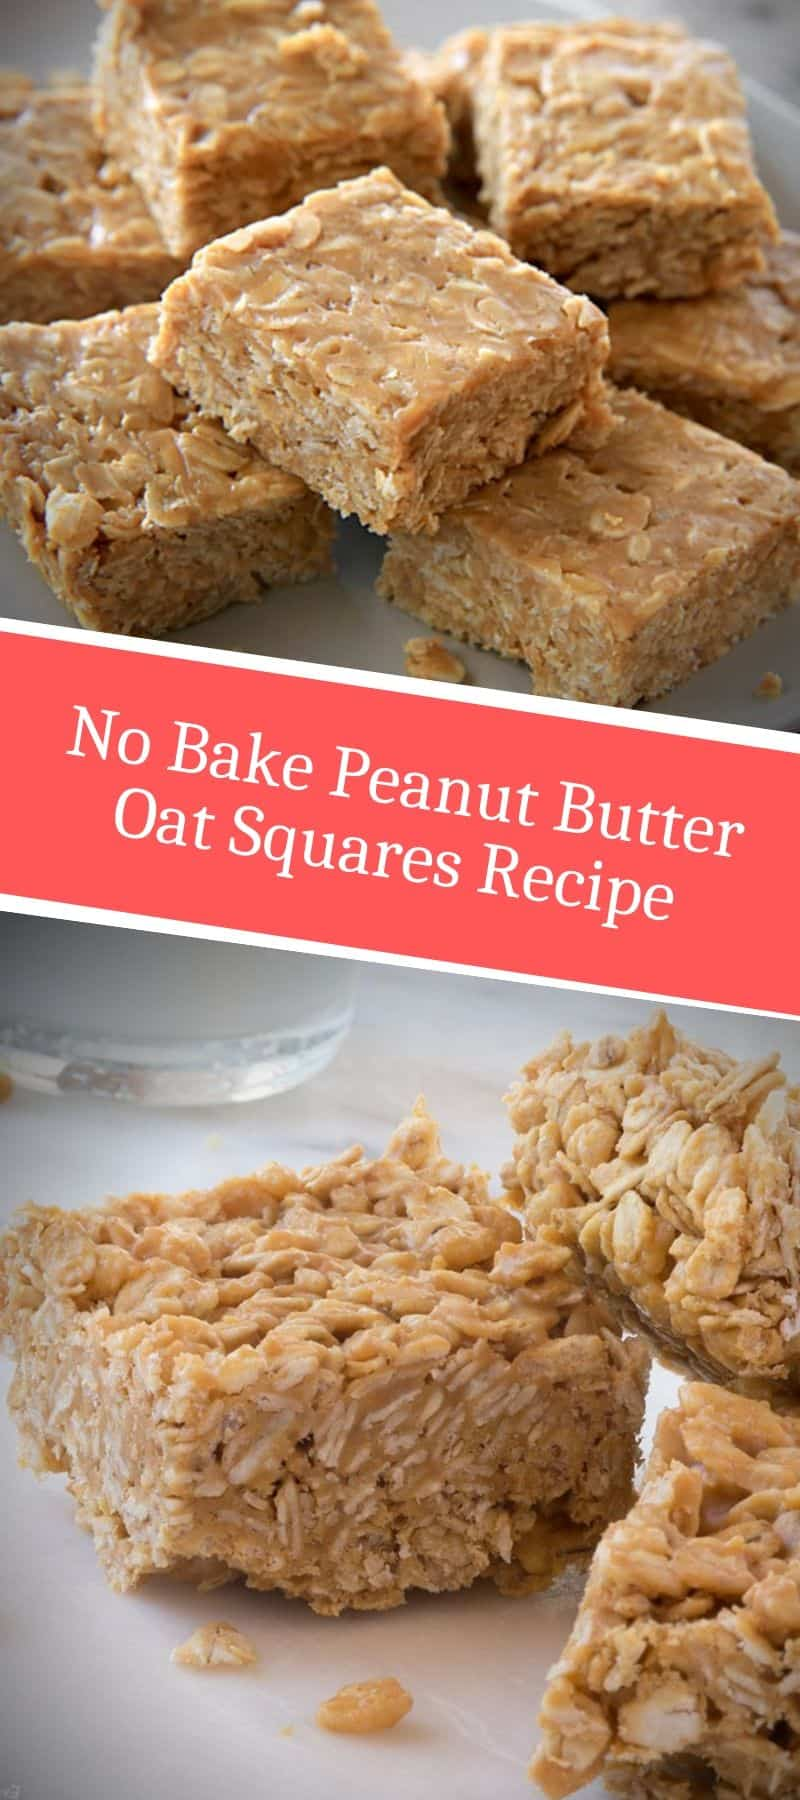 No Bake Peanut Butter Oat Squares Recipe 3